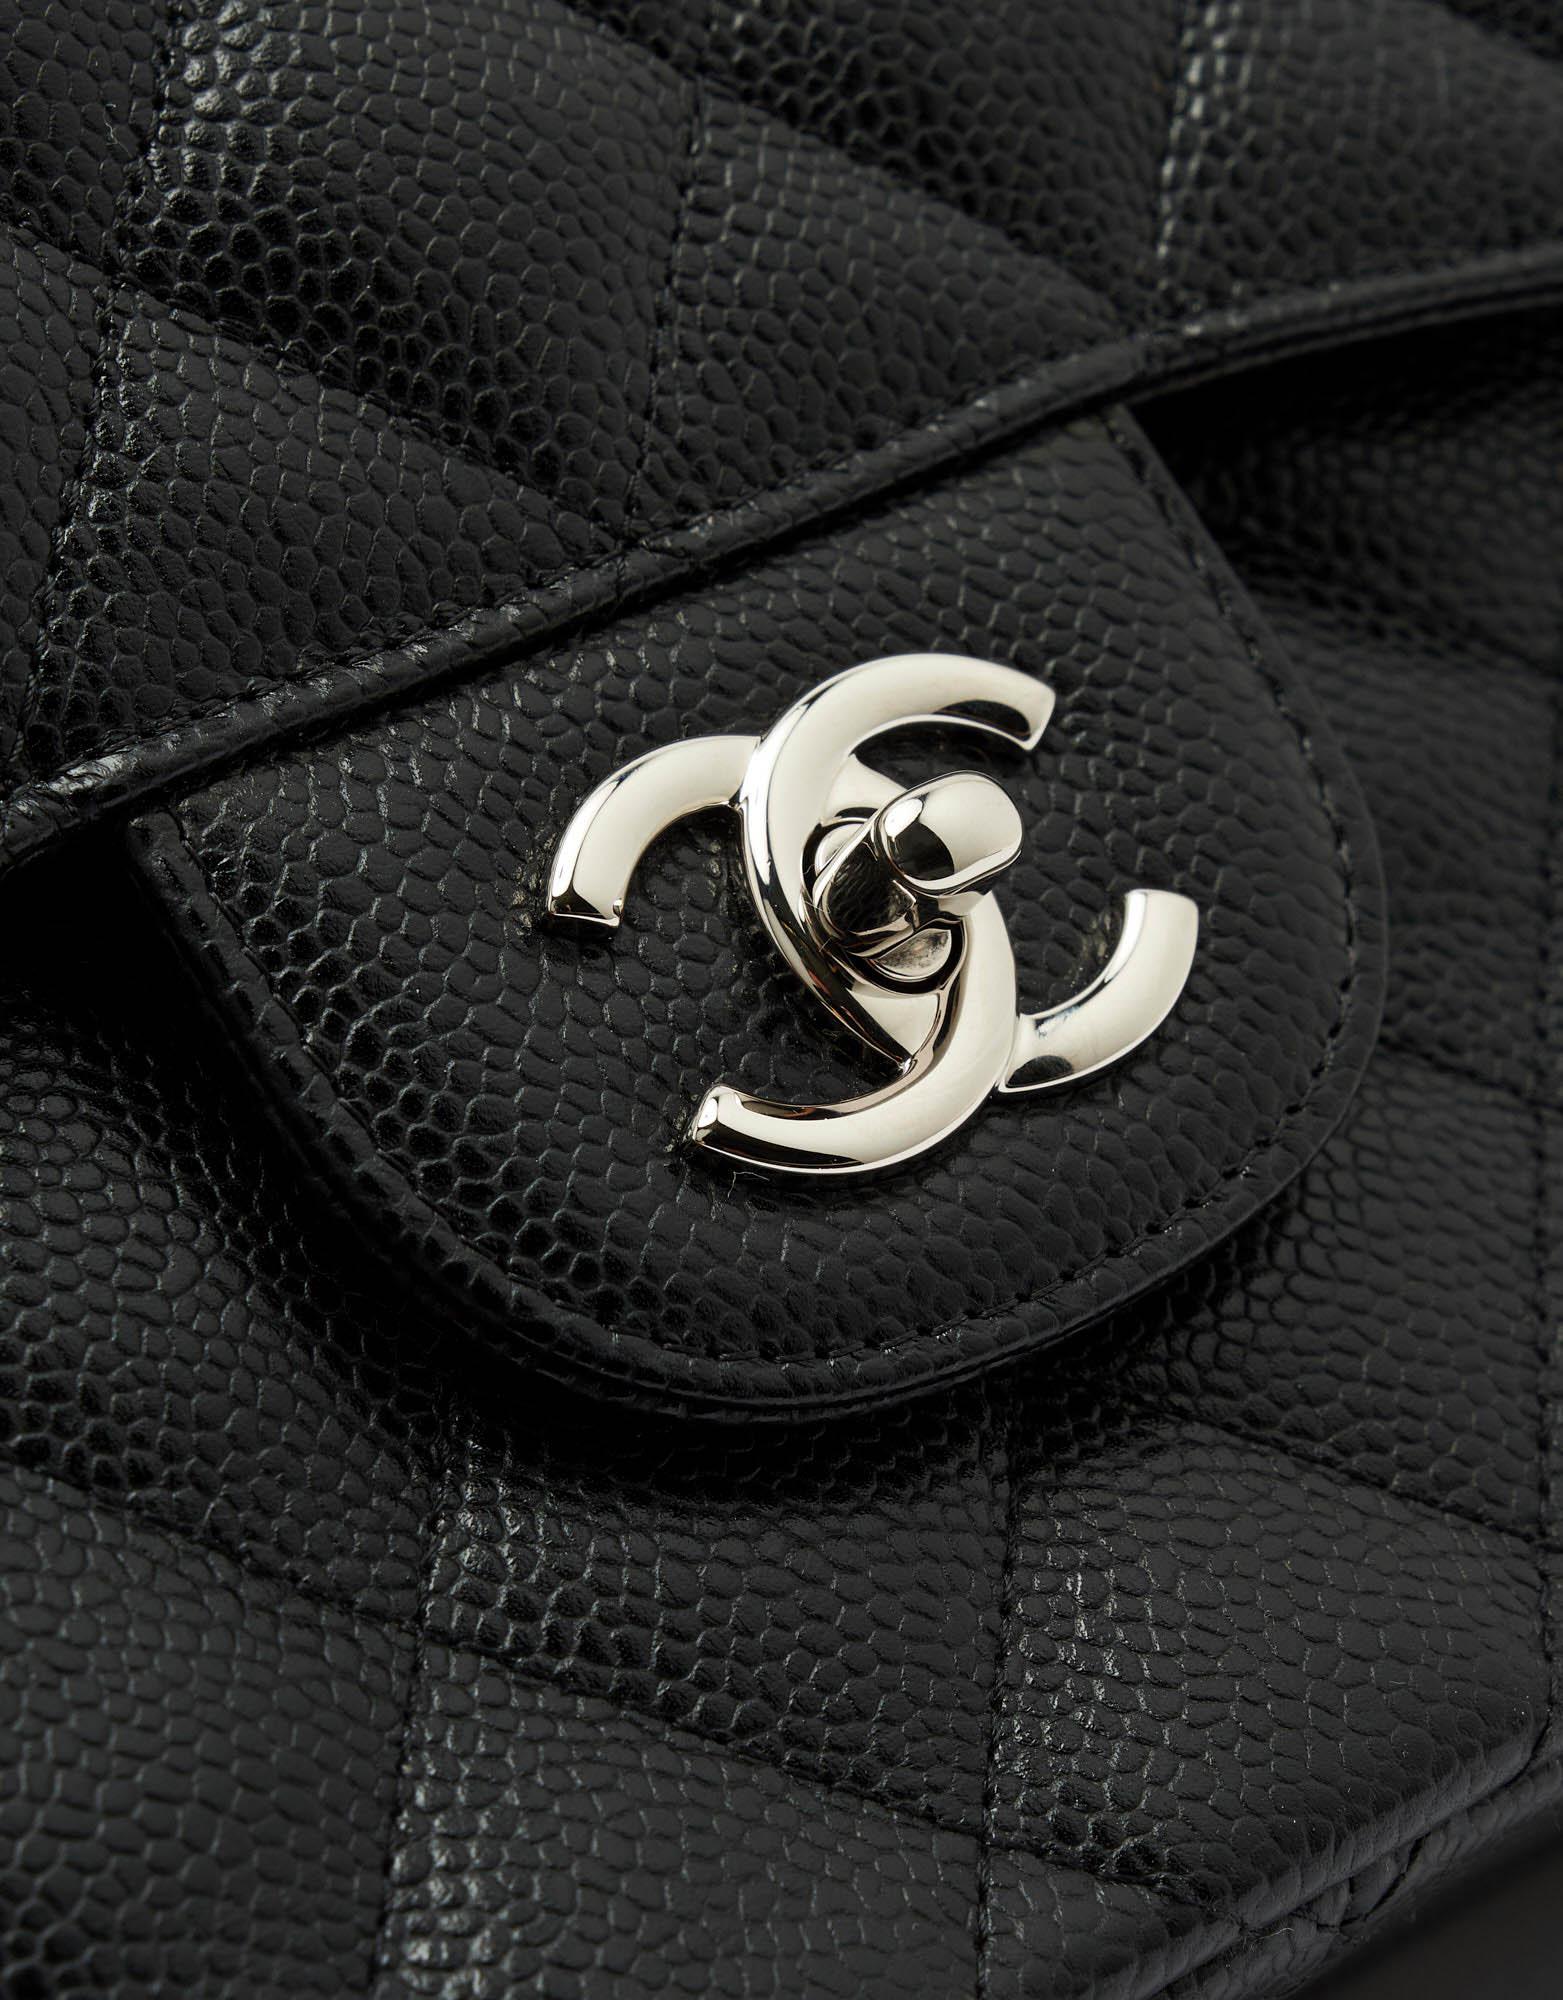 Chanel Timeless Jumbo Caviar Black